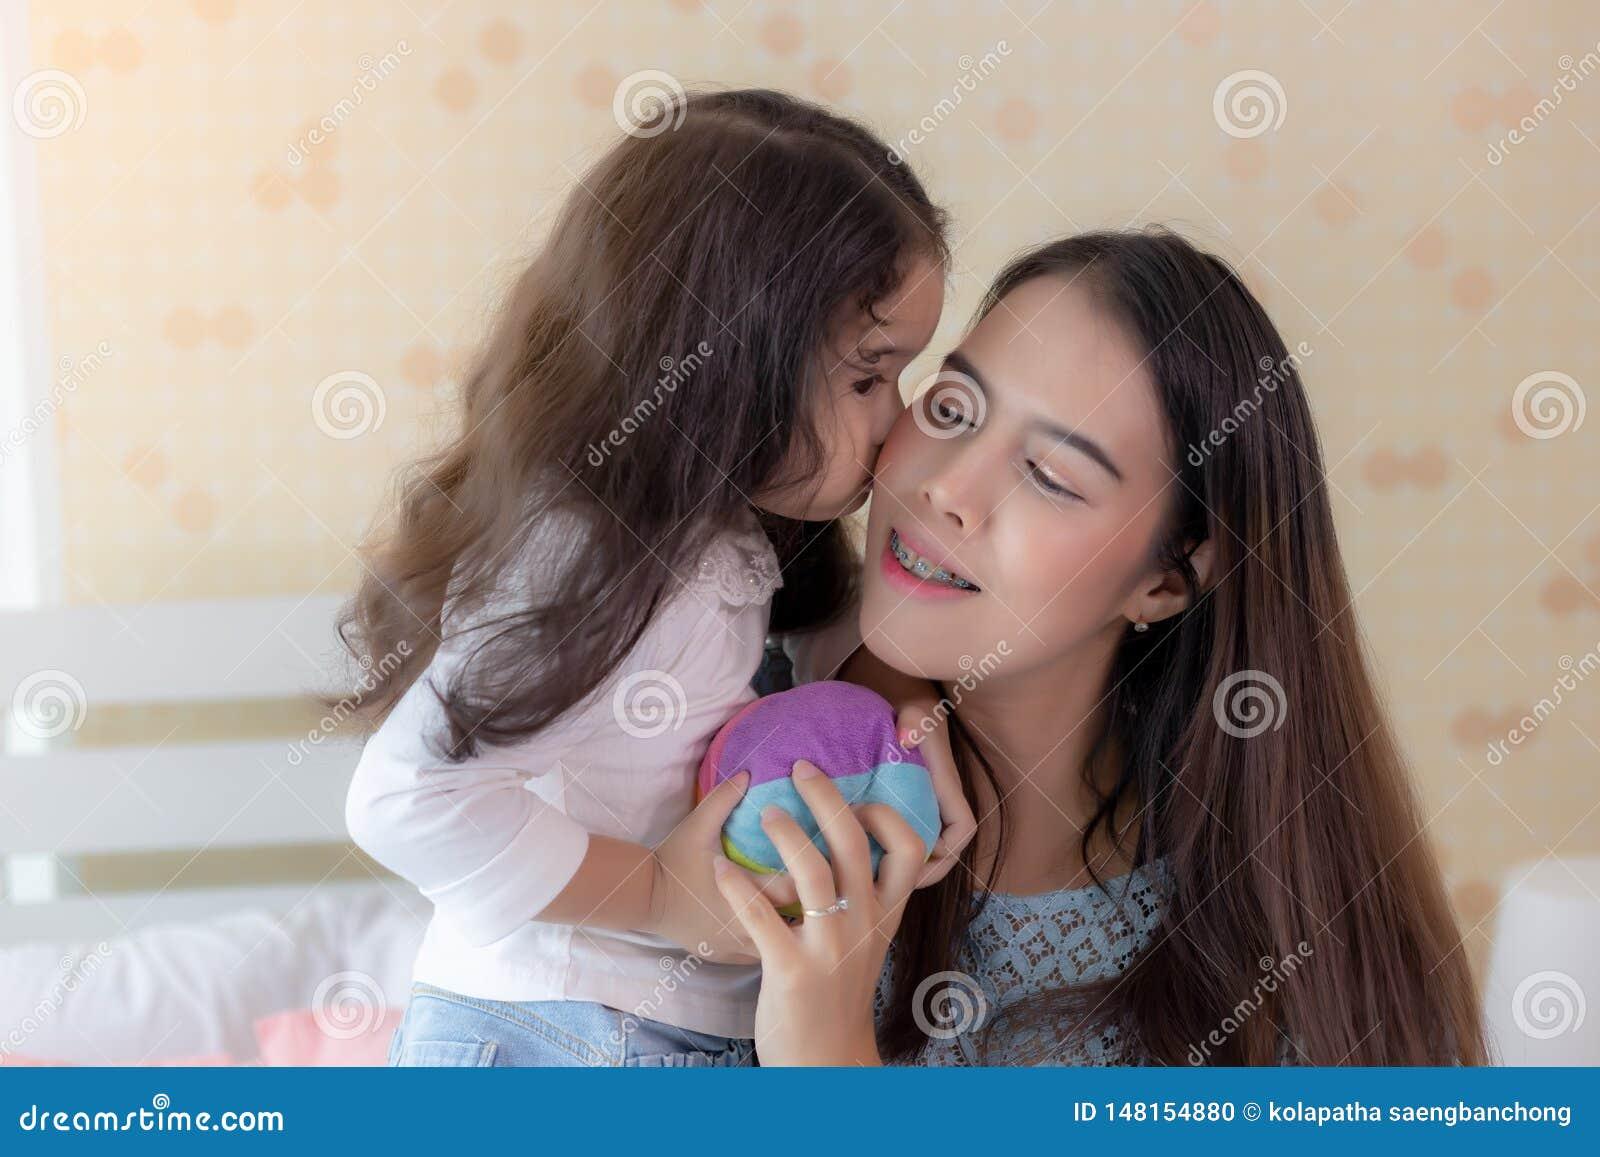 2 Girls Kissing Blowjob